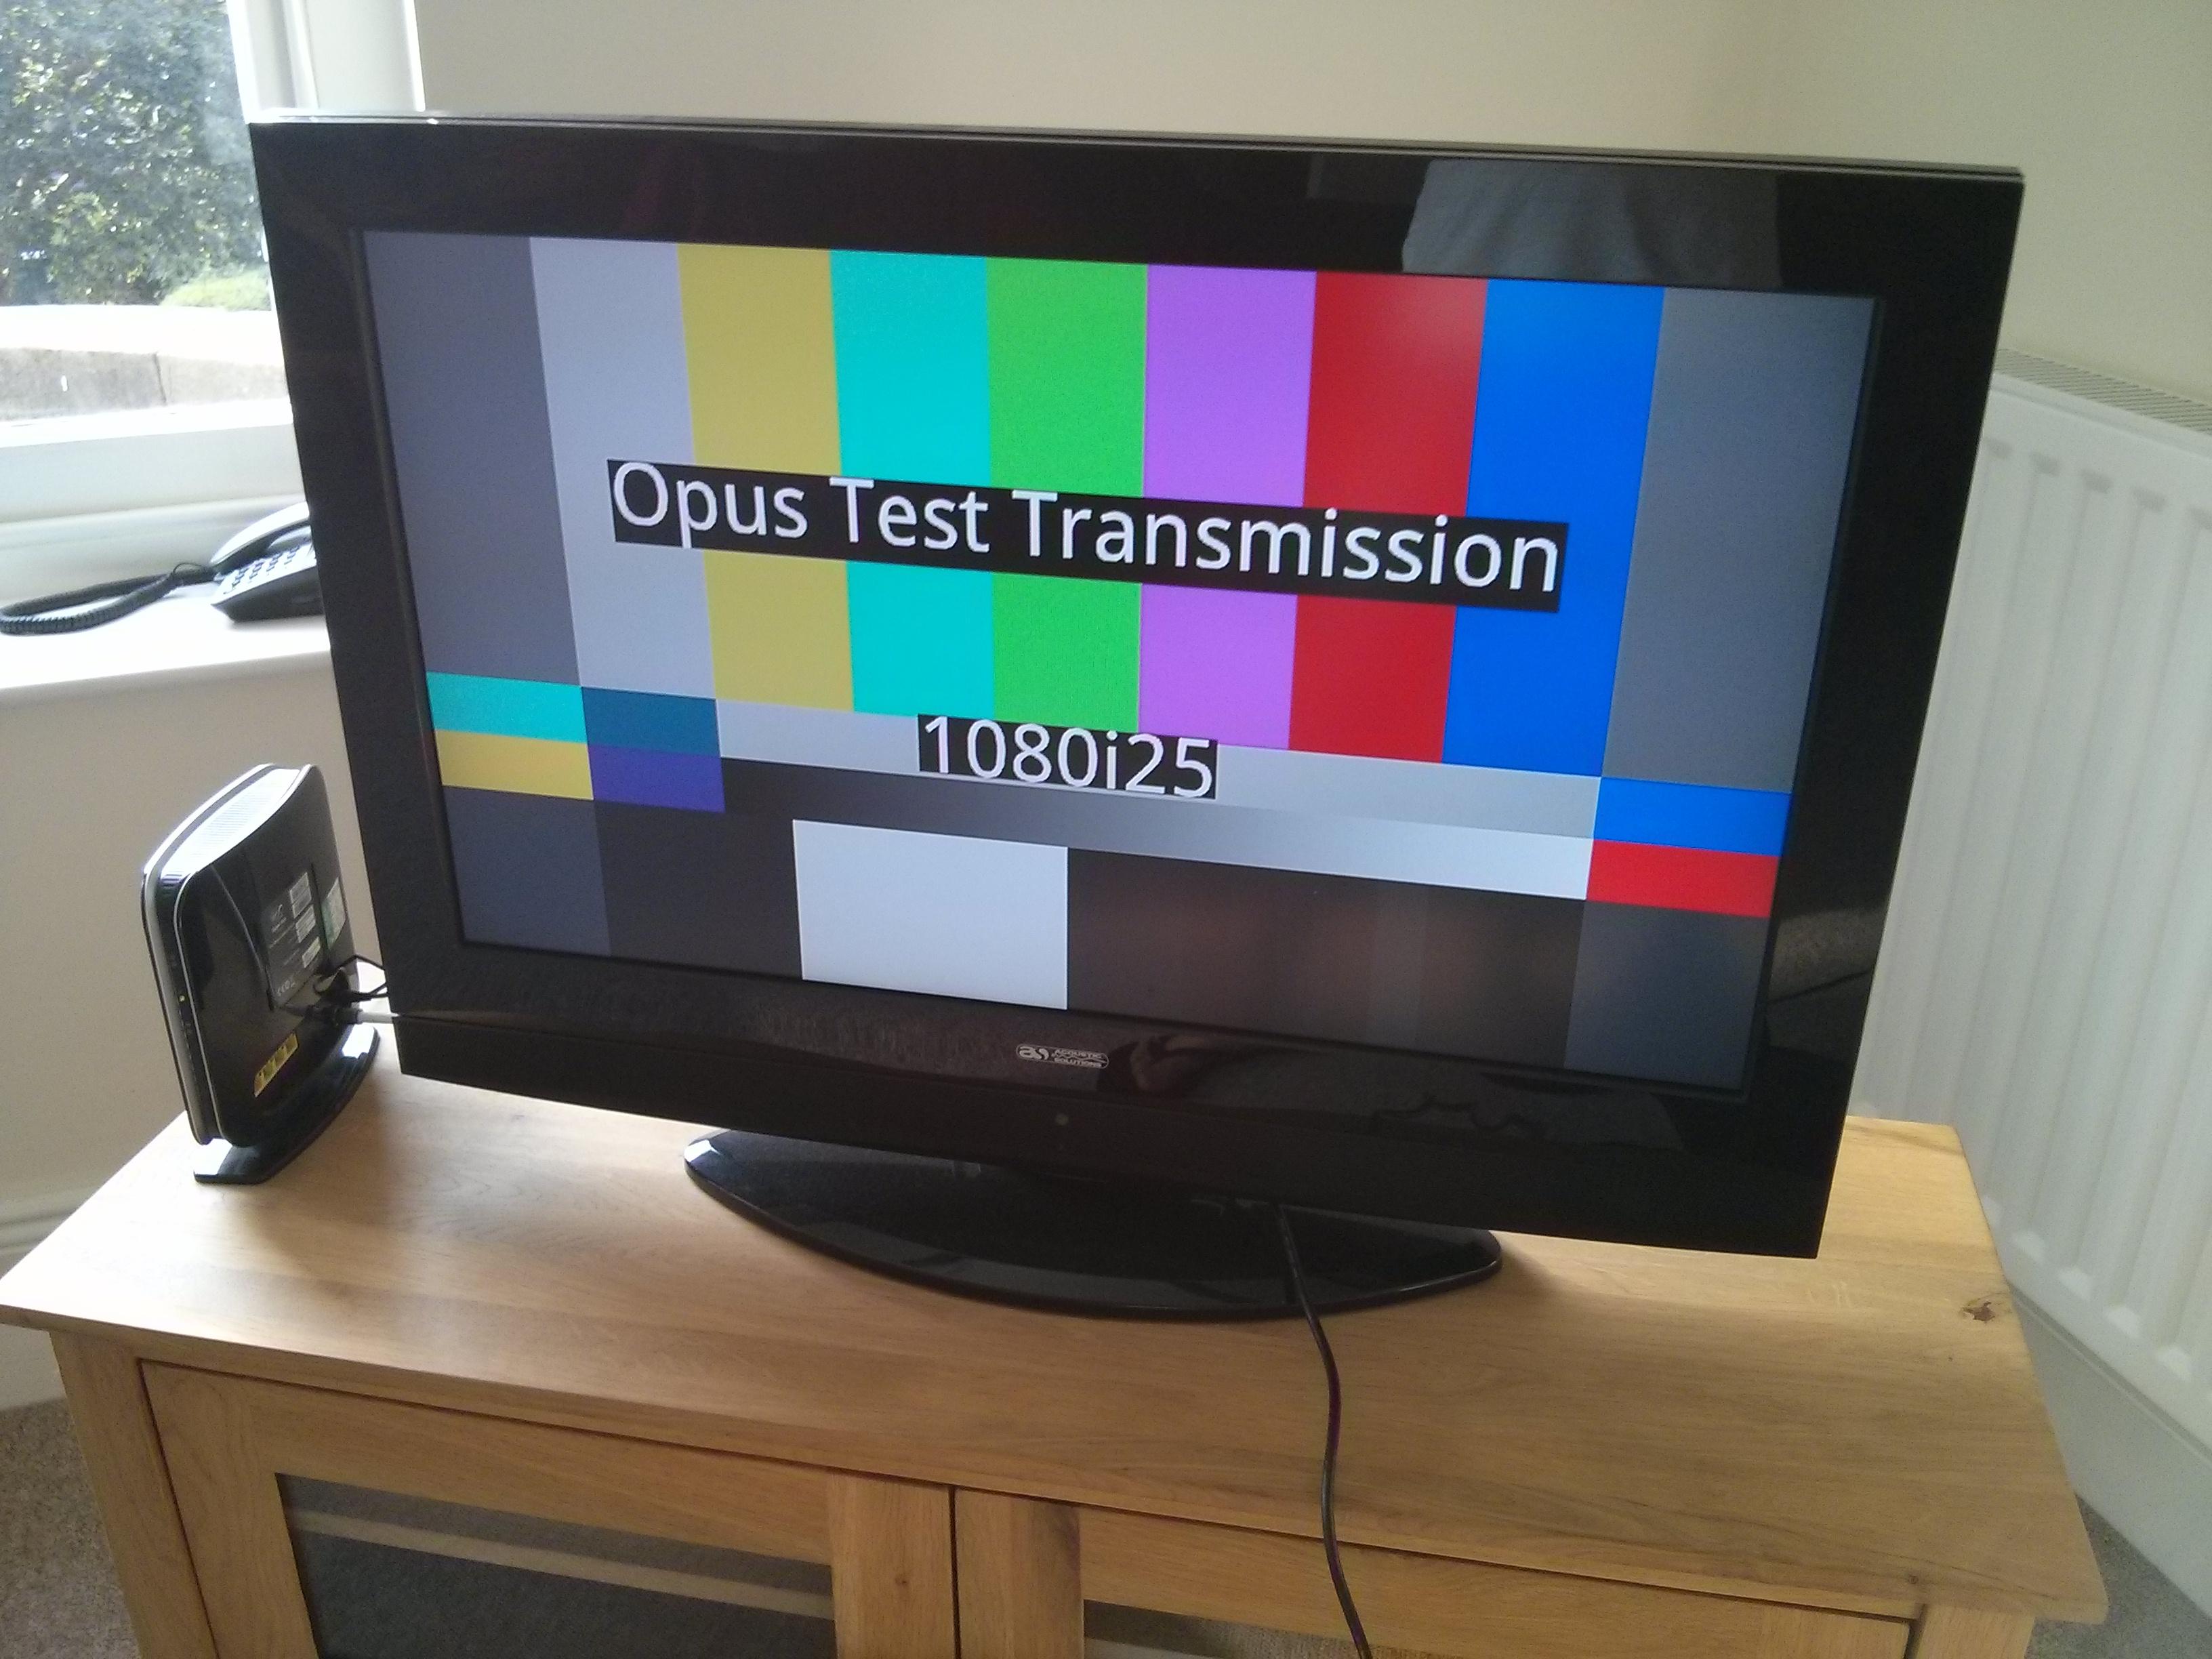 OBE Opus Test Transmission